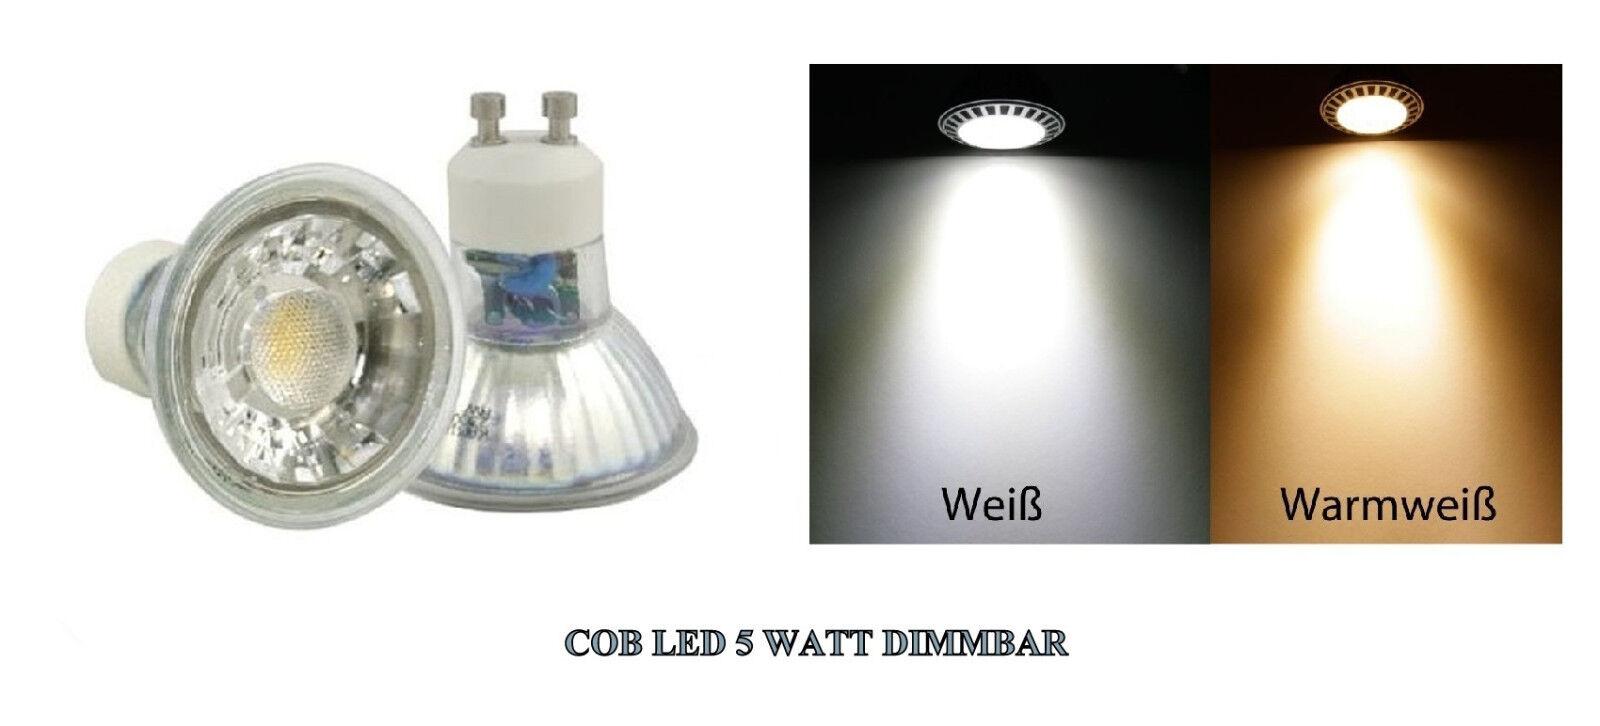 Dimmbare 5W = 50W COB High Power Reflektor LED Leuchtmittel 230V Weiss Warmweiss